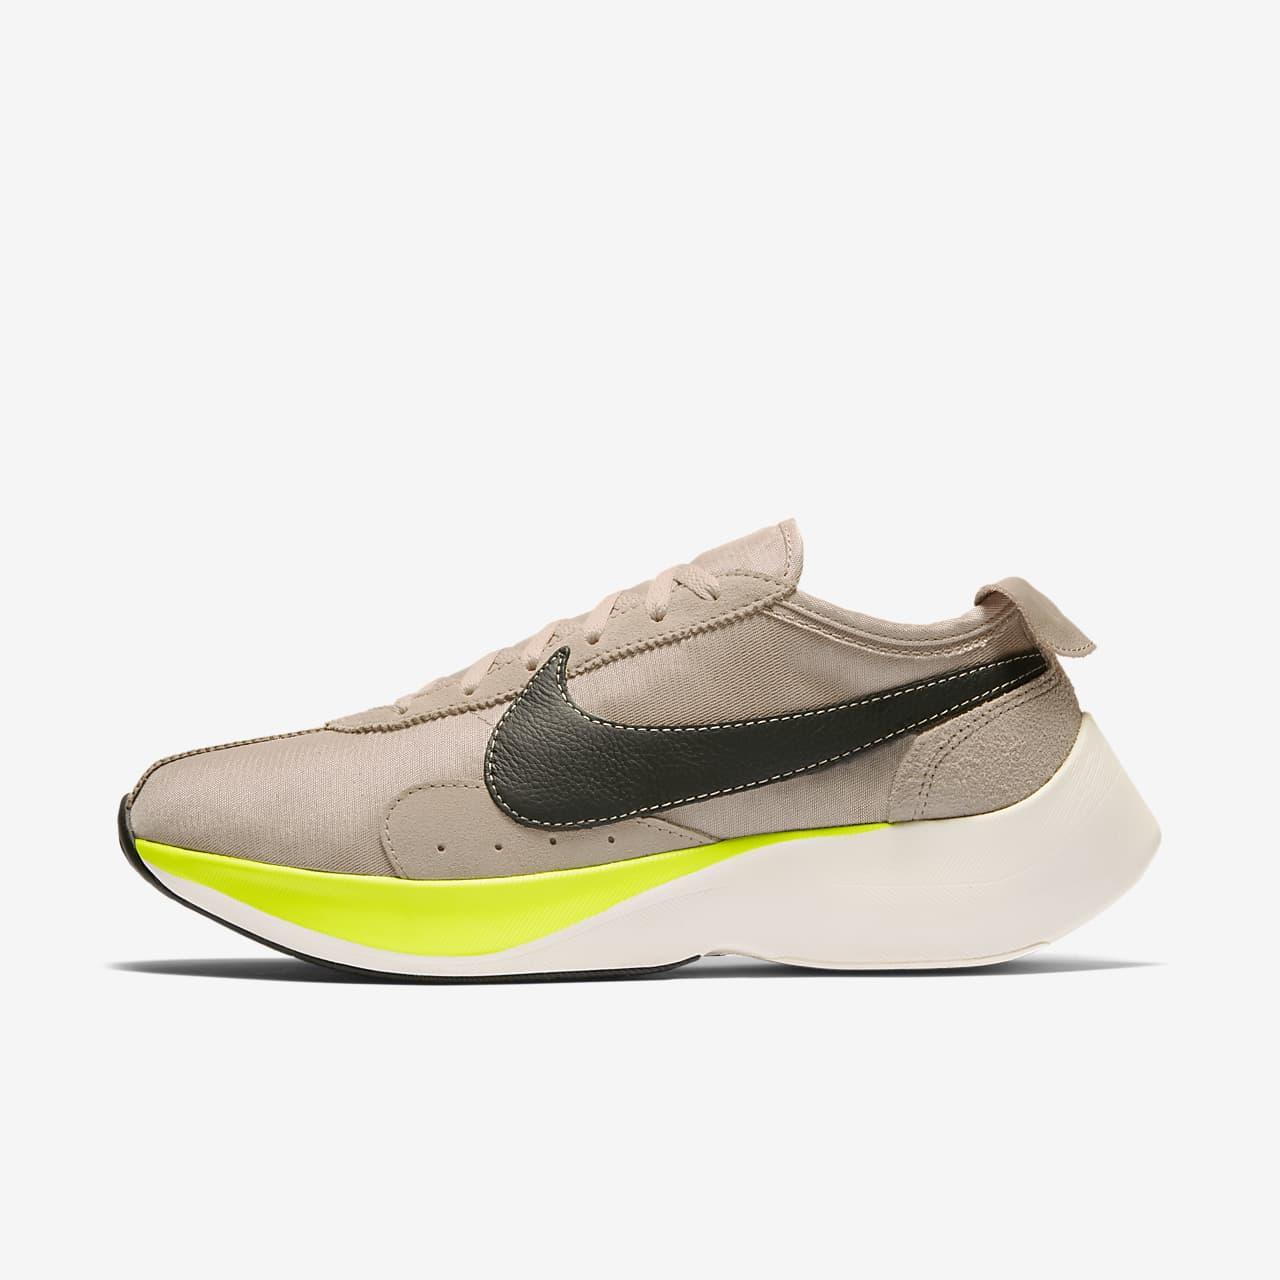 Nike Moon Racer Men's Shoe. Nike NL